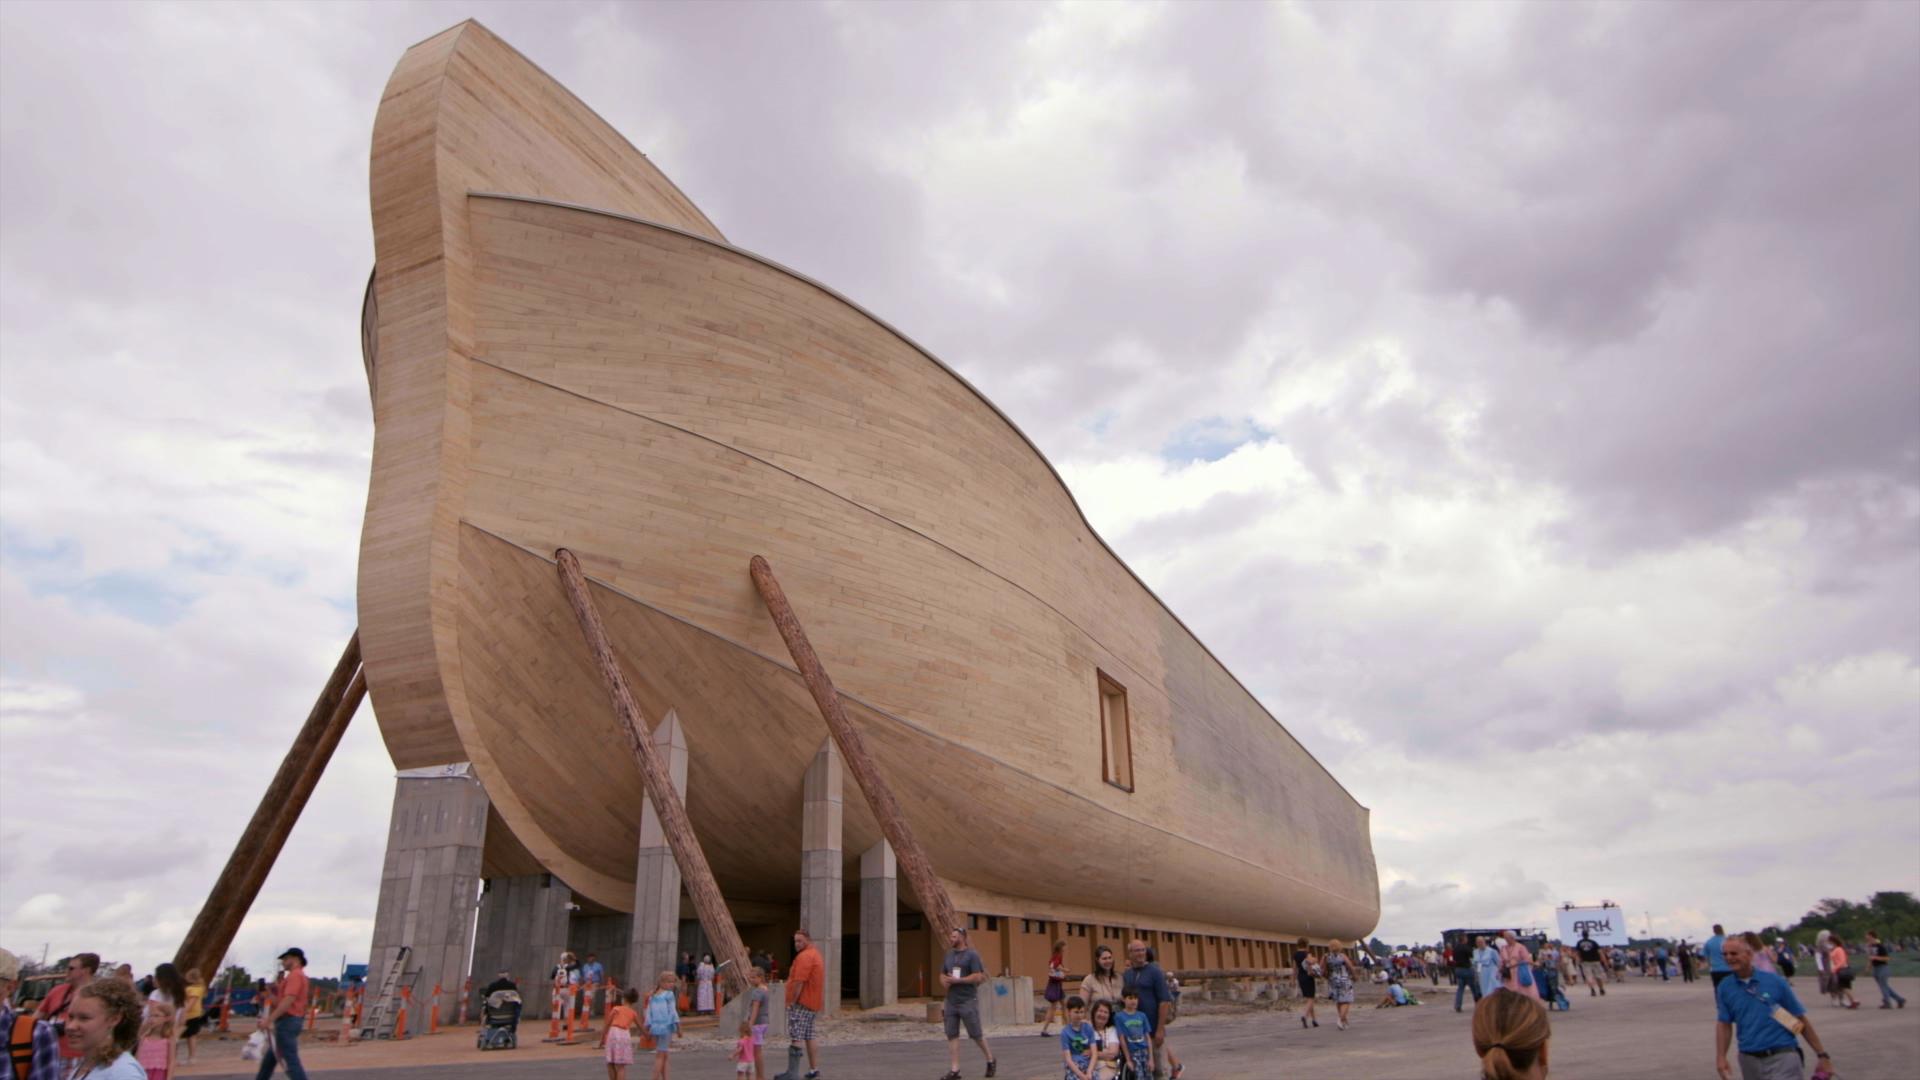 Bill Nye: Science Guy - Director David Alvarado on religion and science?